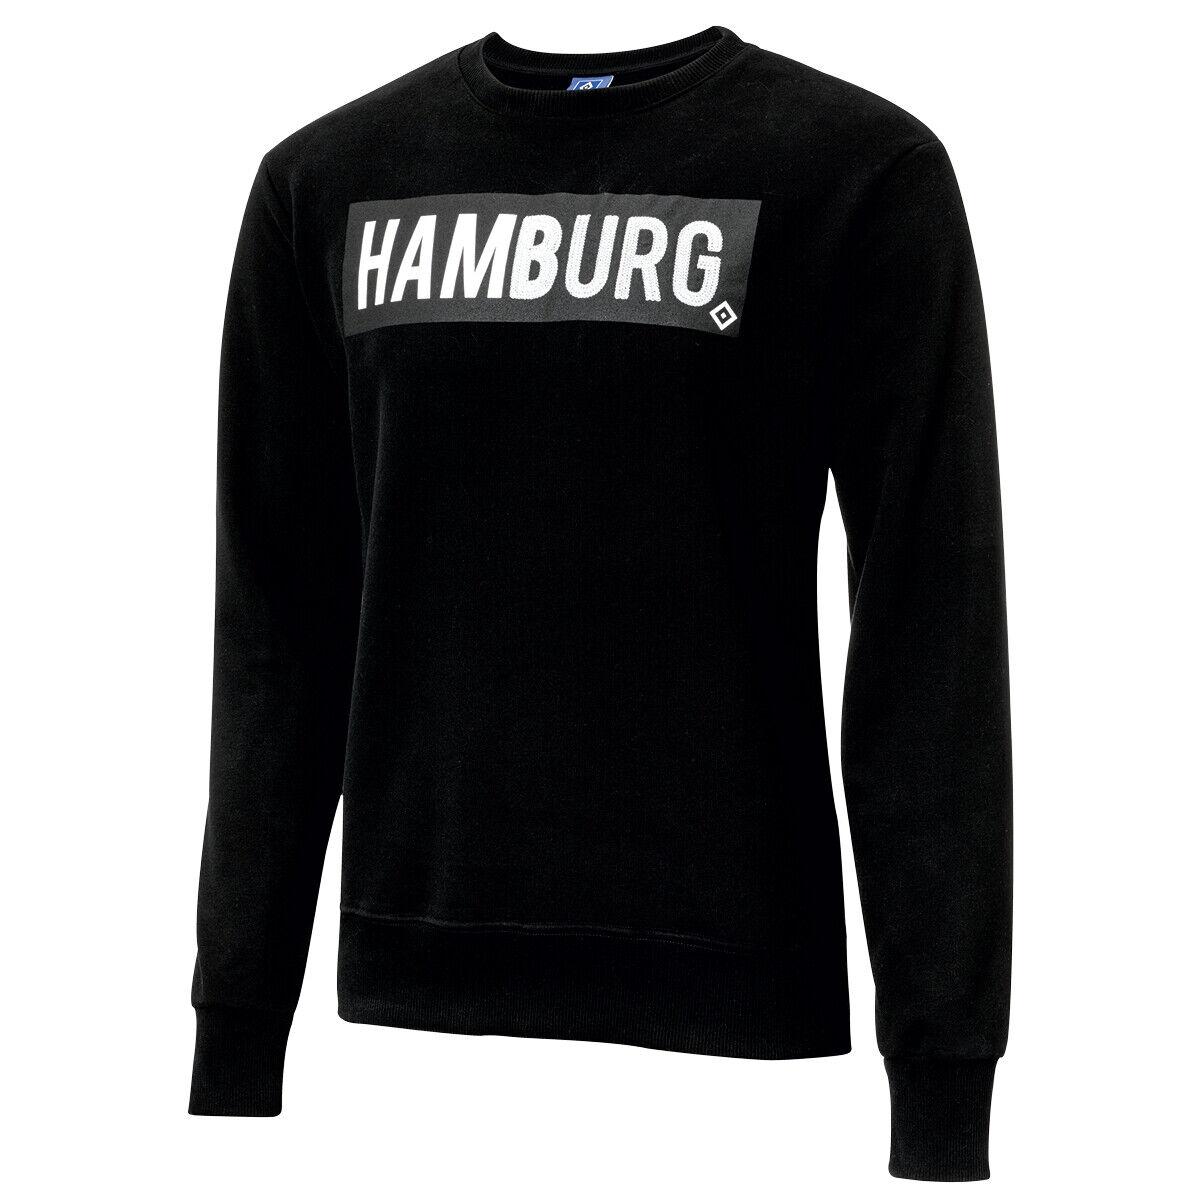 HSV HSV HSV Sweatshirt  Sönke  Gr. M - 4XL  Hamburger SV 771cd1